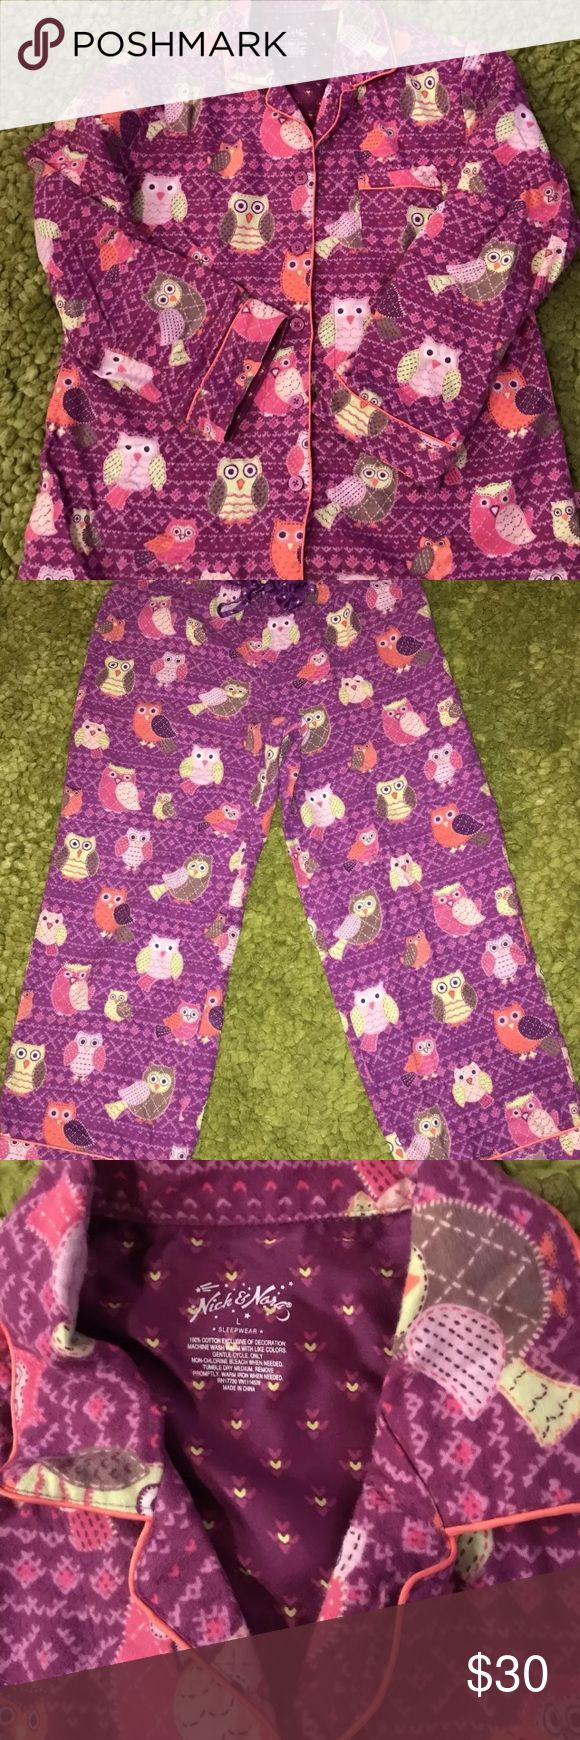 Nick And Nora Owls Pajama SET size L Great Condition Nick and Nora Owls PJ set, flannel like new!  Pants and top size L! Nick & Nora Intimates & Sleepwear Pajamas